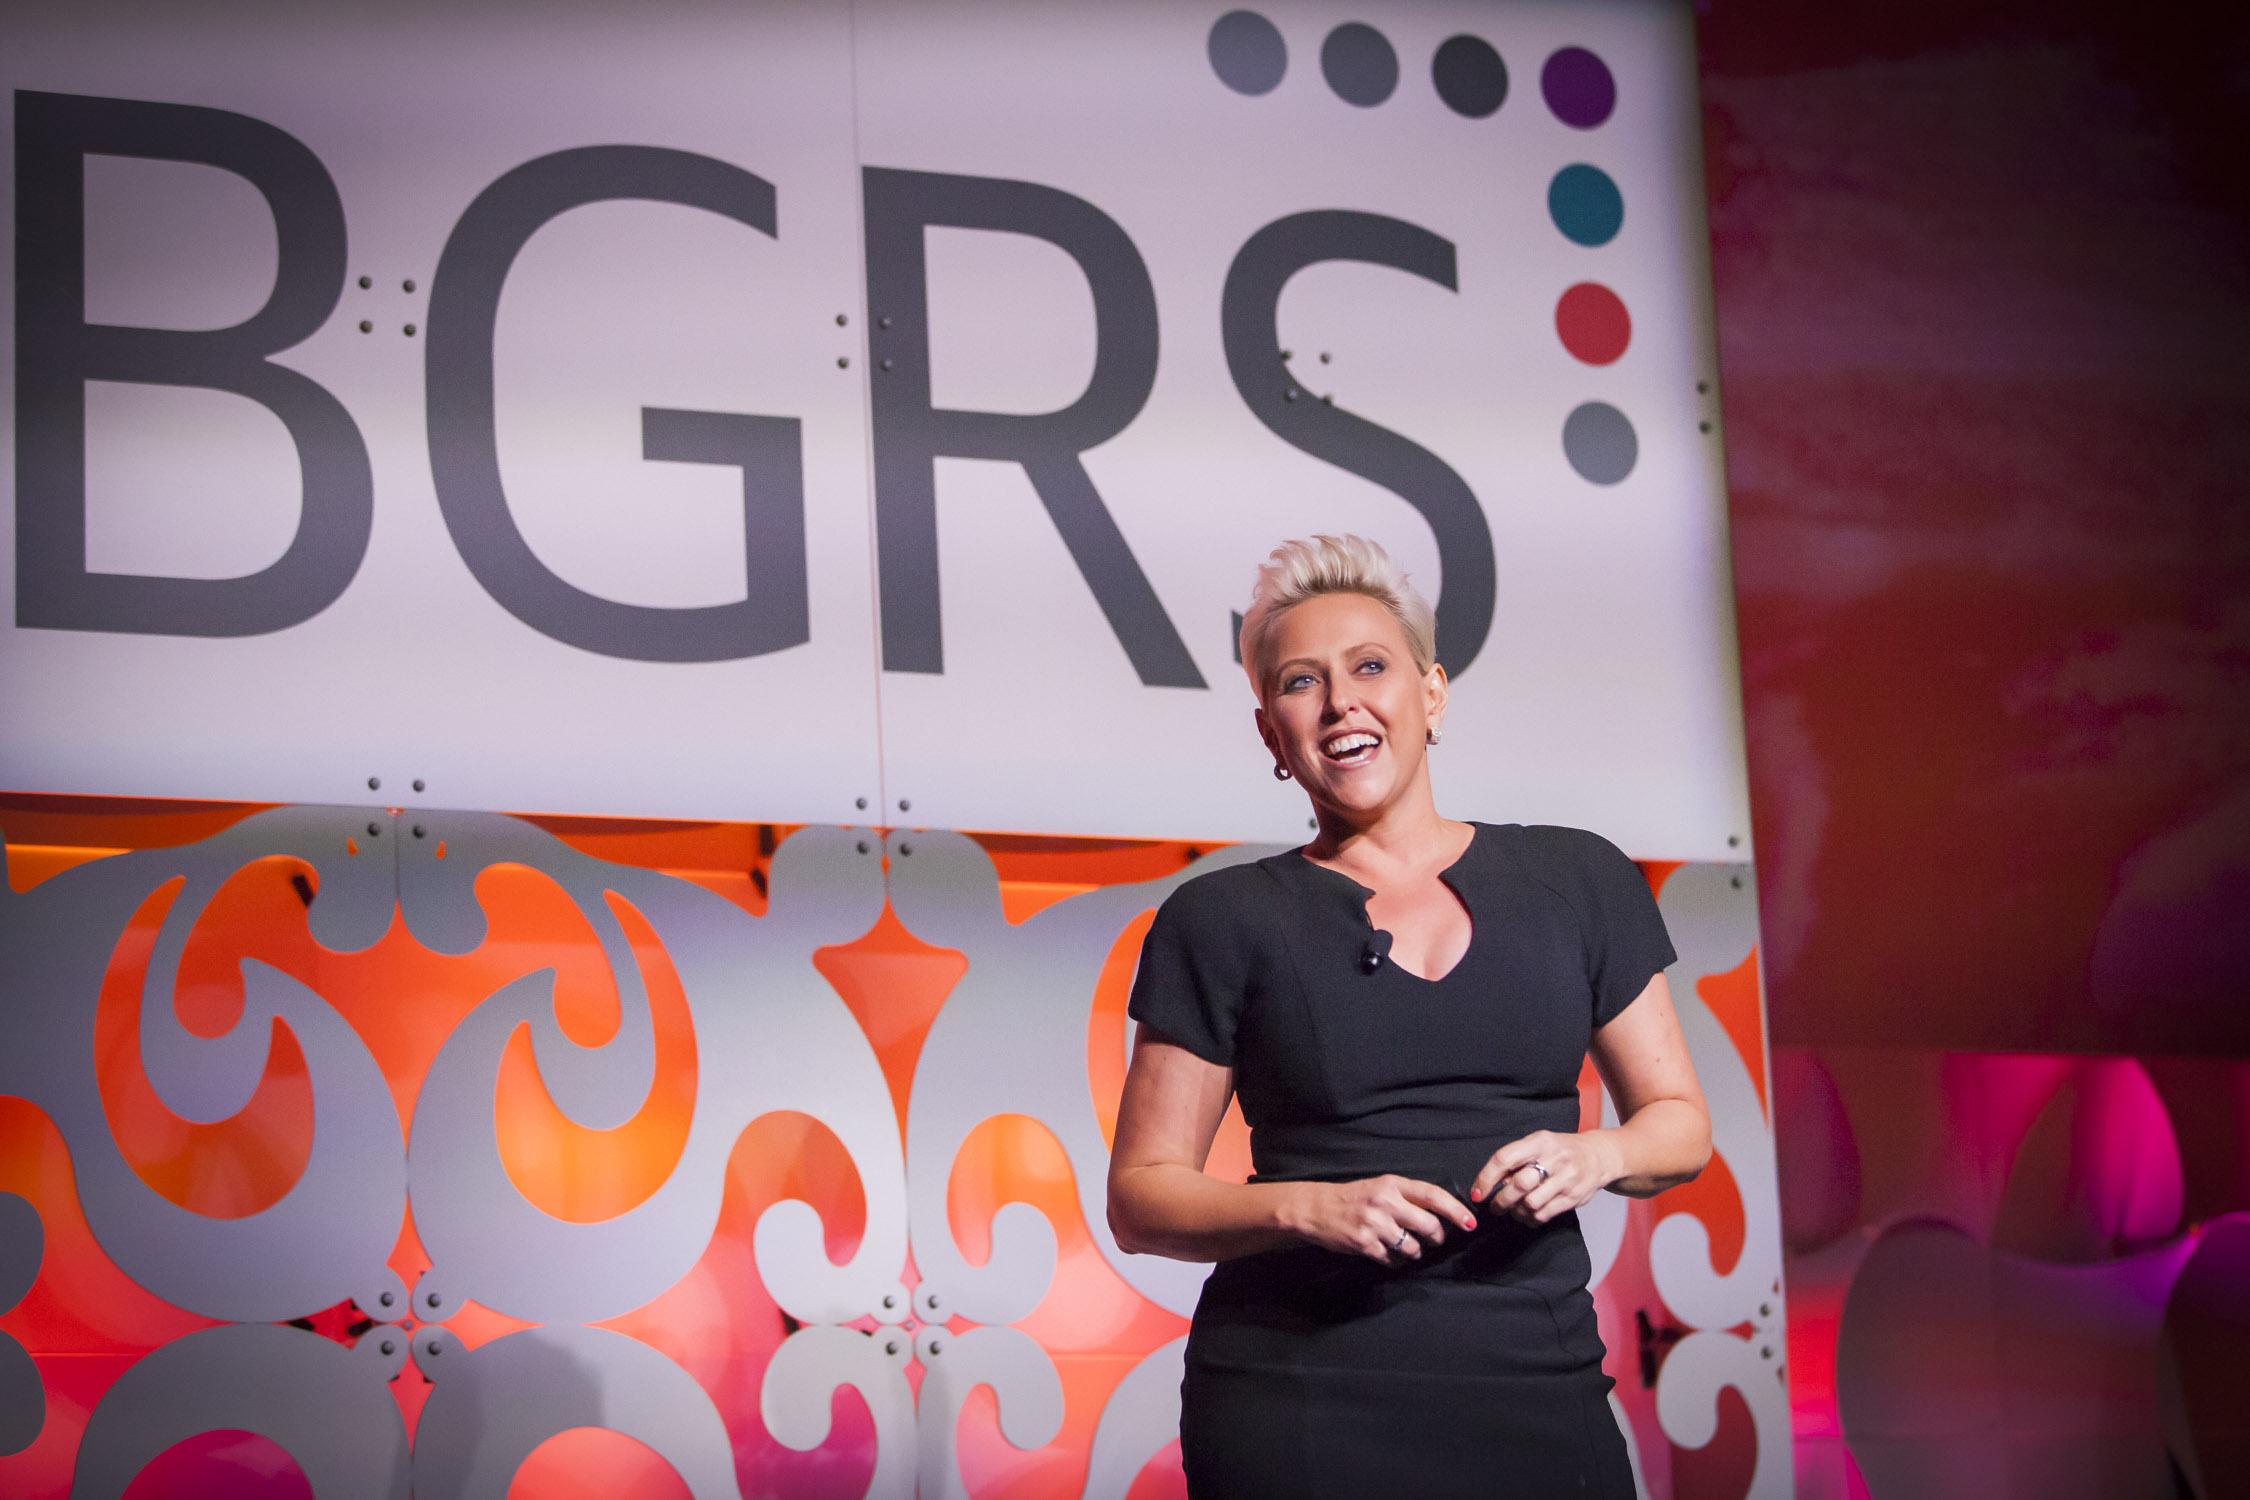 Motivational speaker Laura Schwartz keynoting at BGRS International Forum.